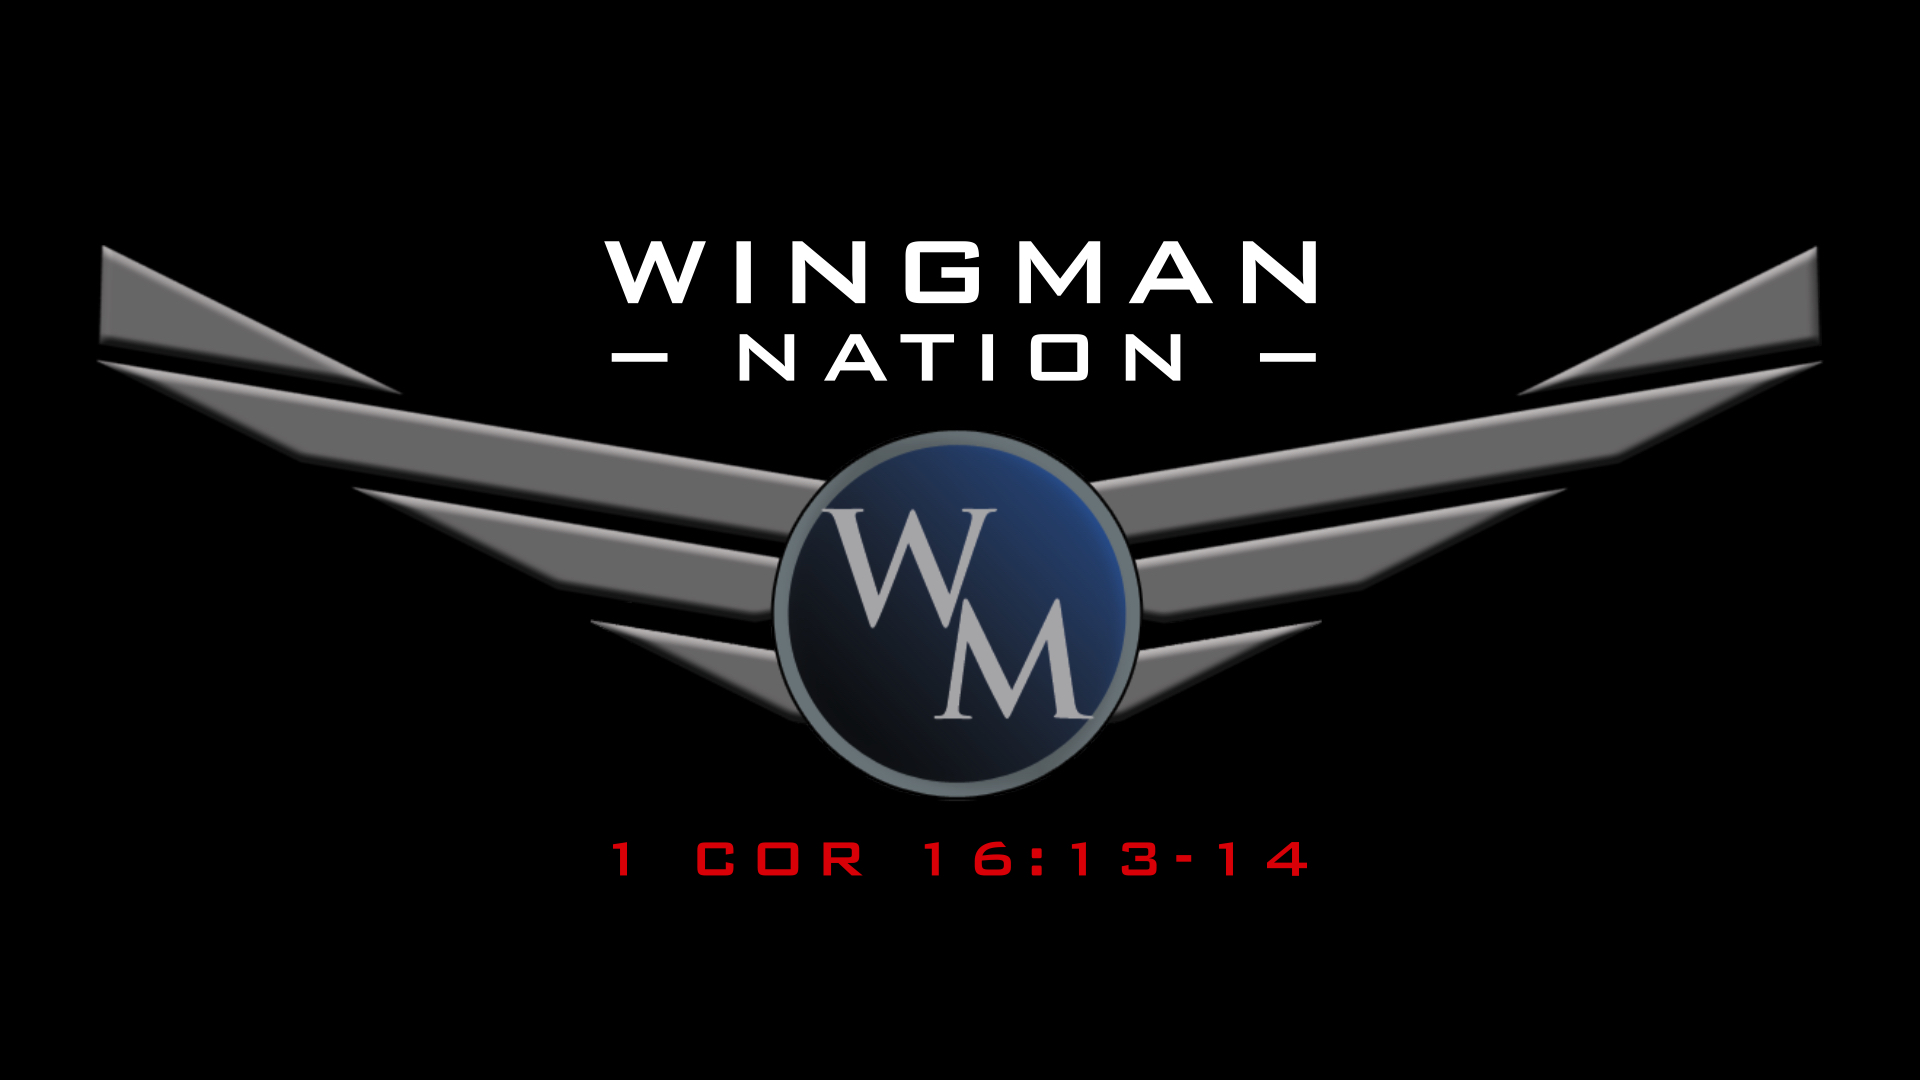 Wingman Nation Headquarters